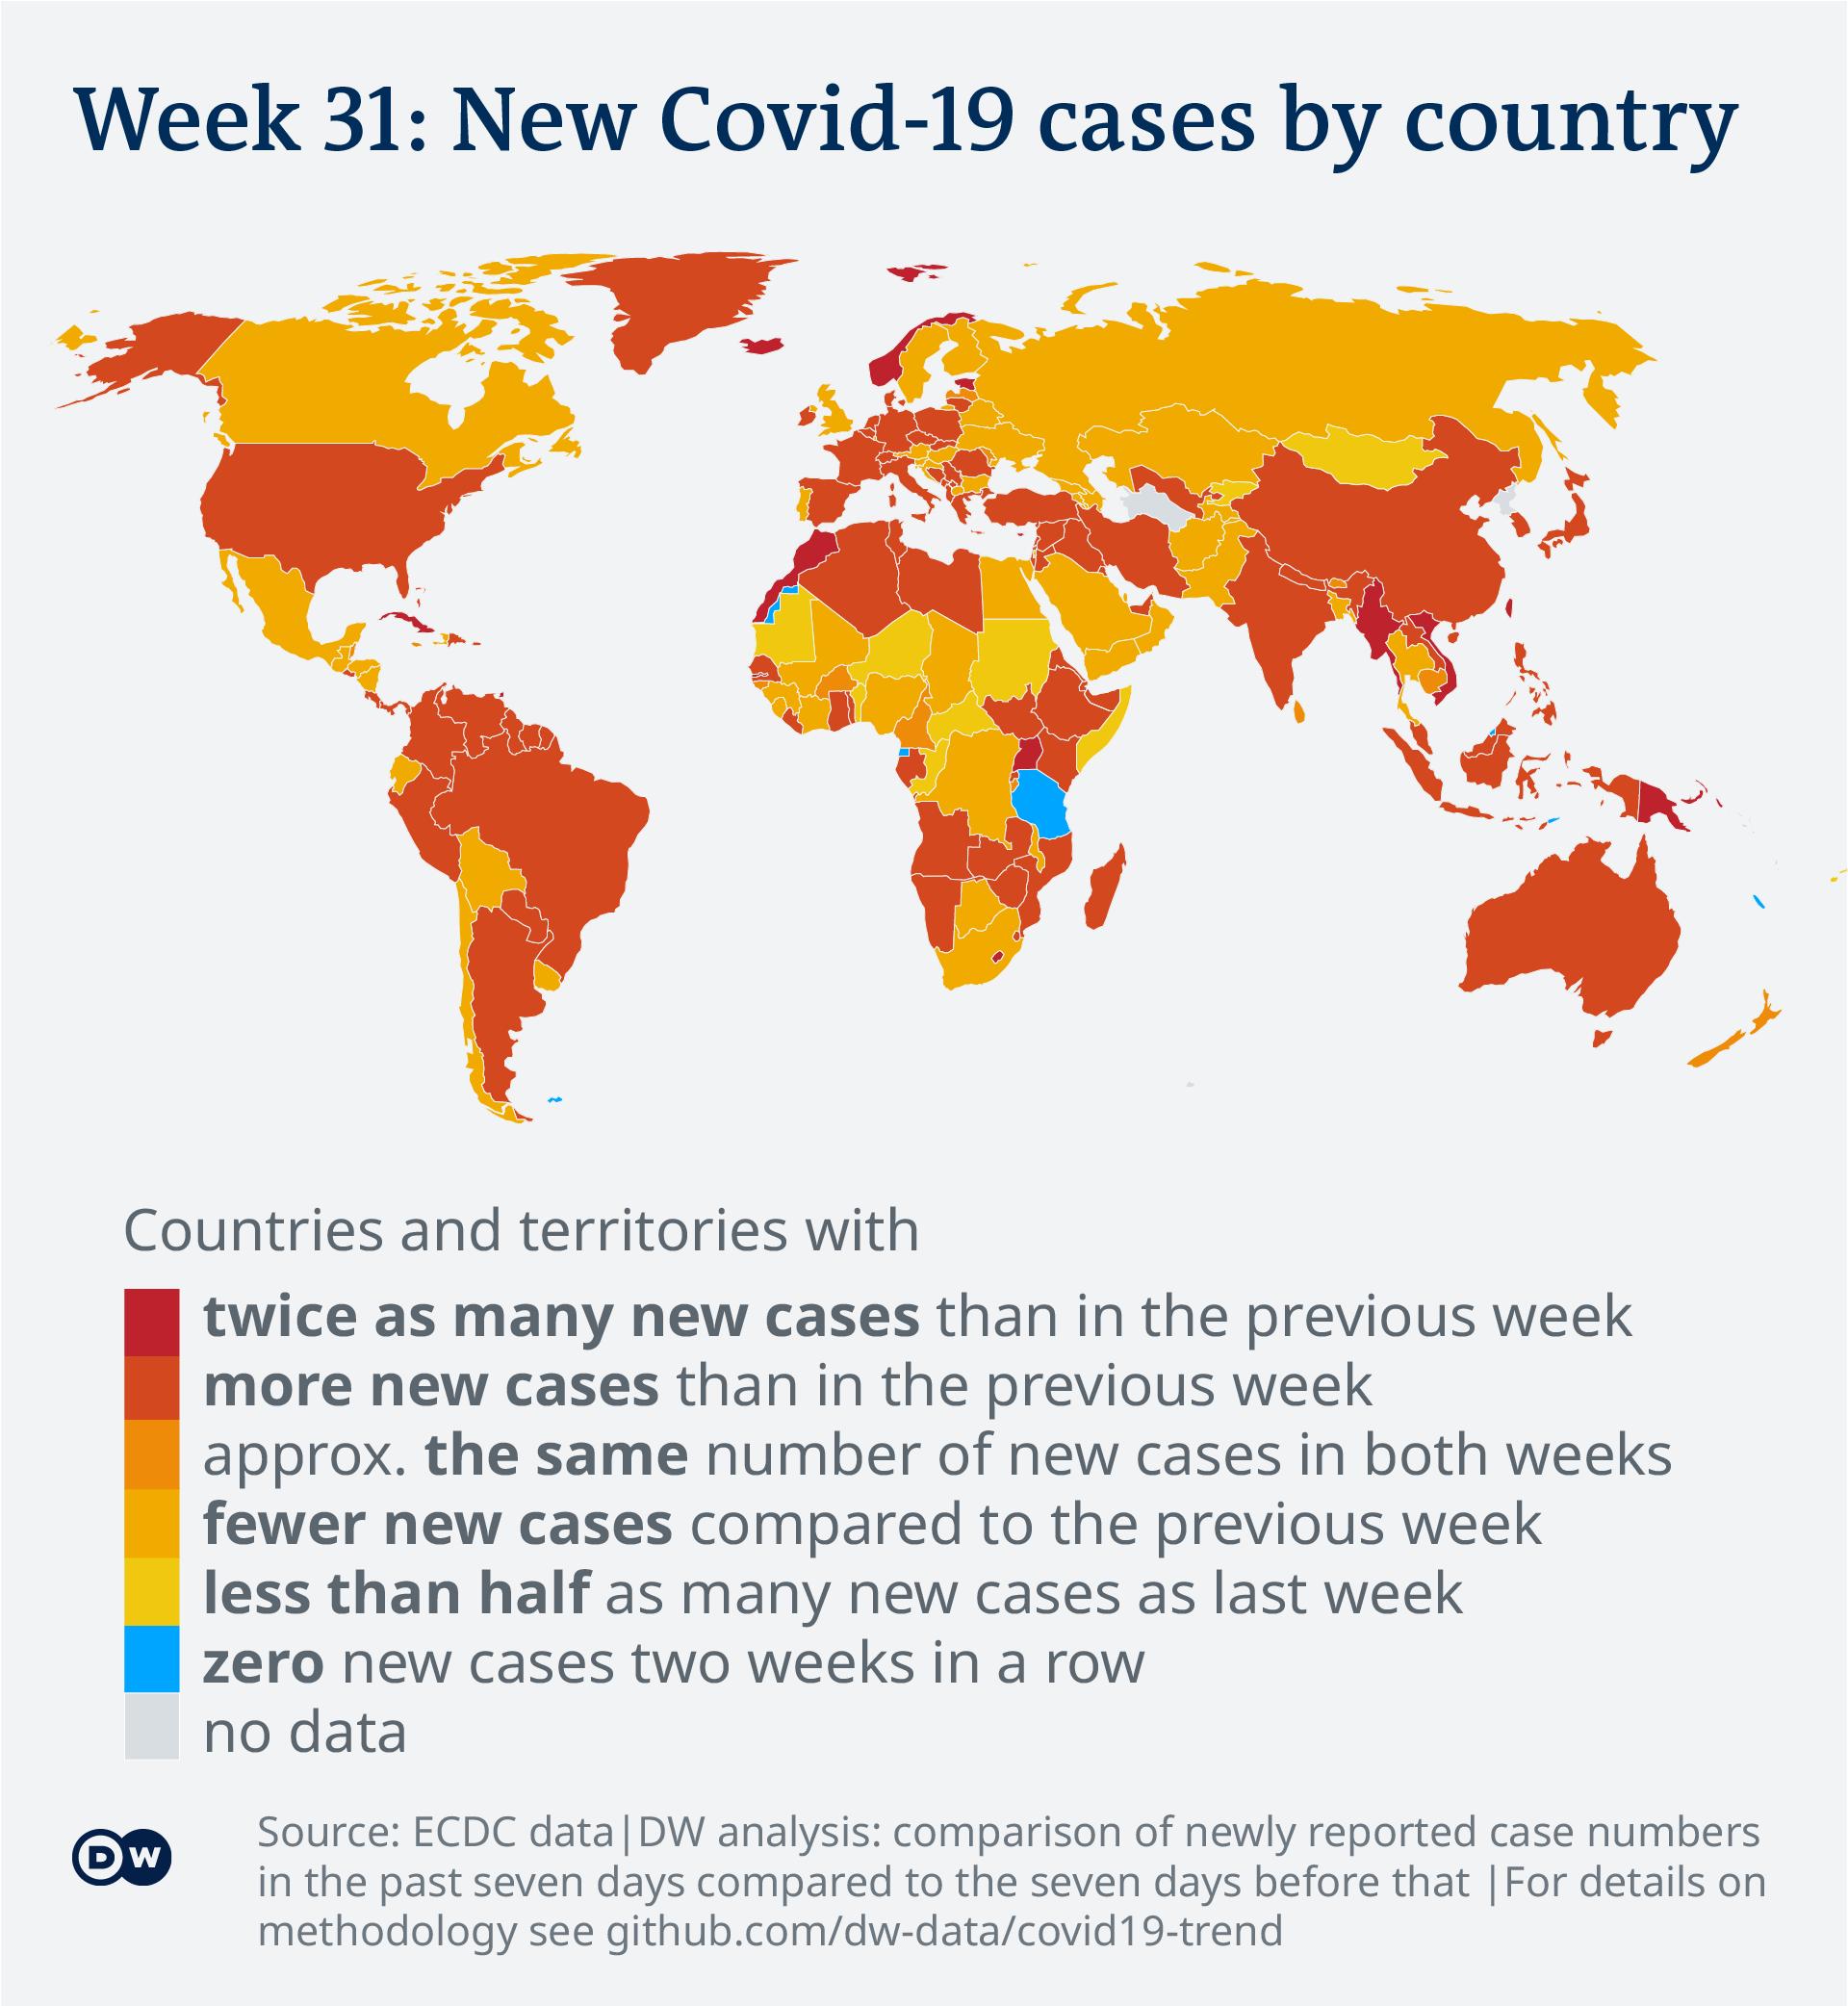 Data visualization: Covid-19 global new case numbers trend - map calendar week 31